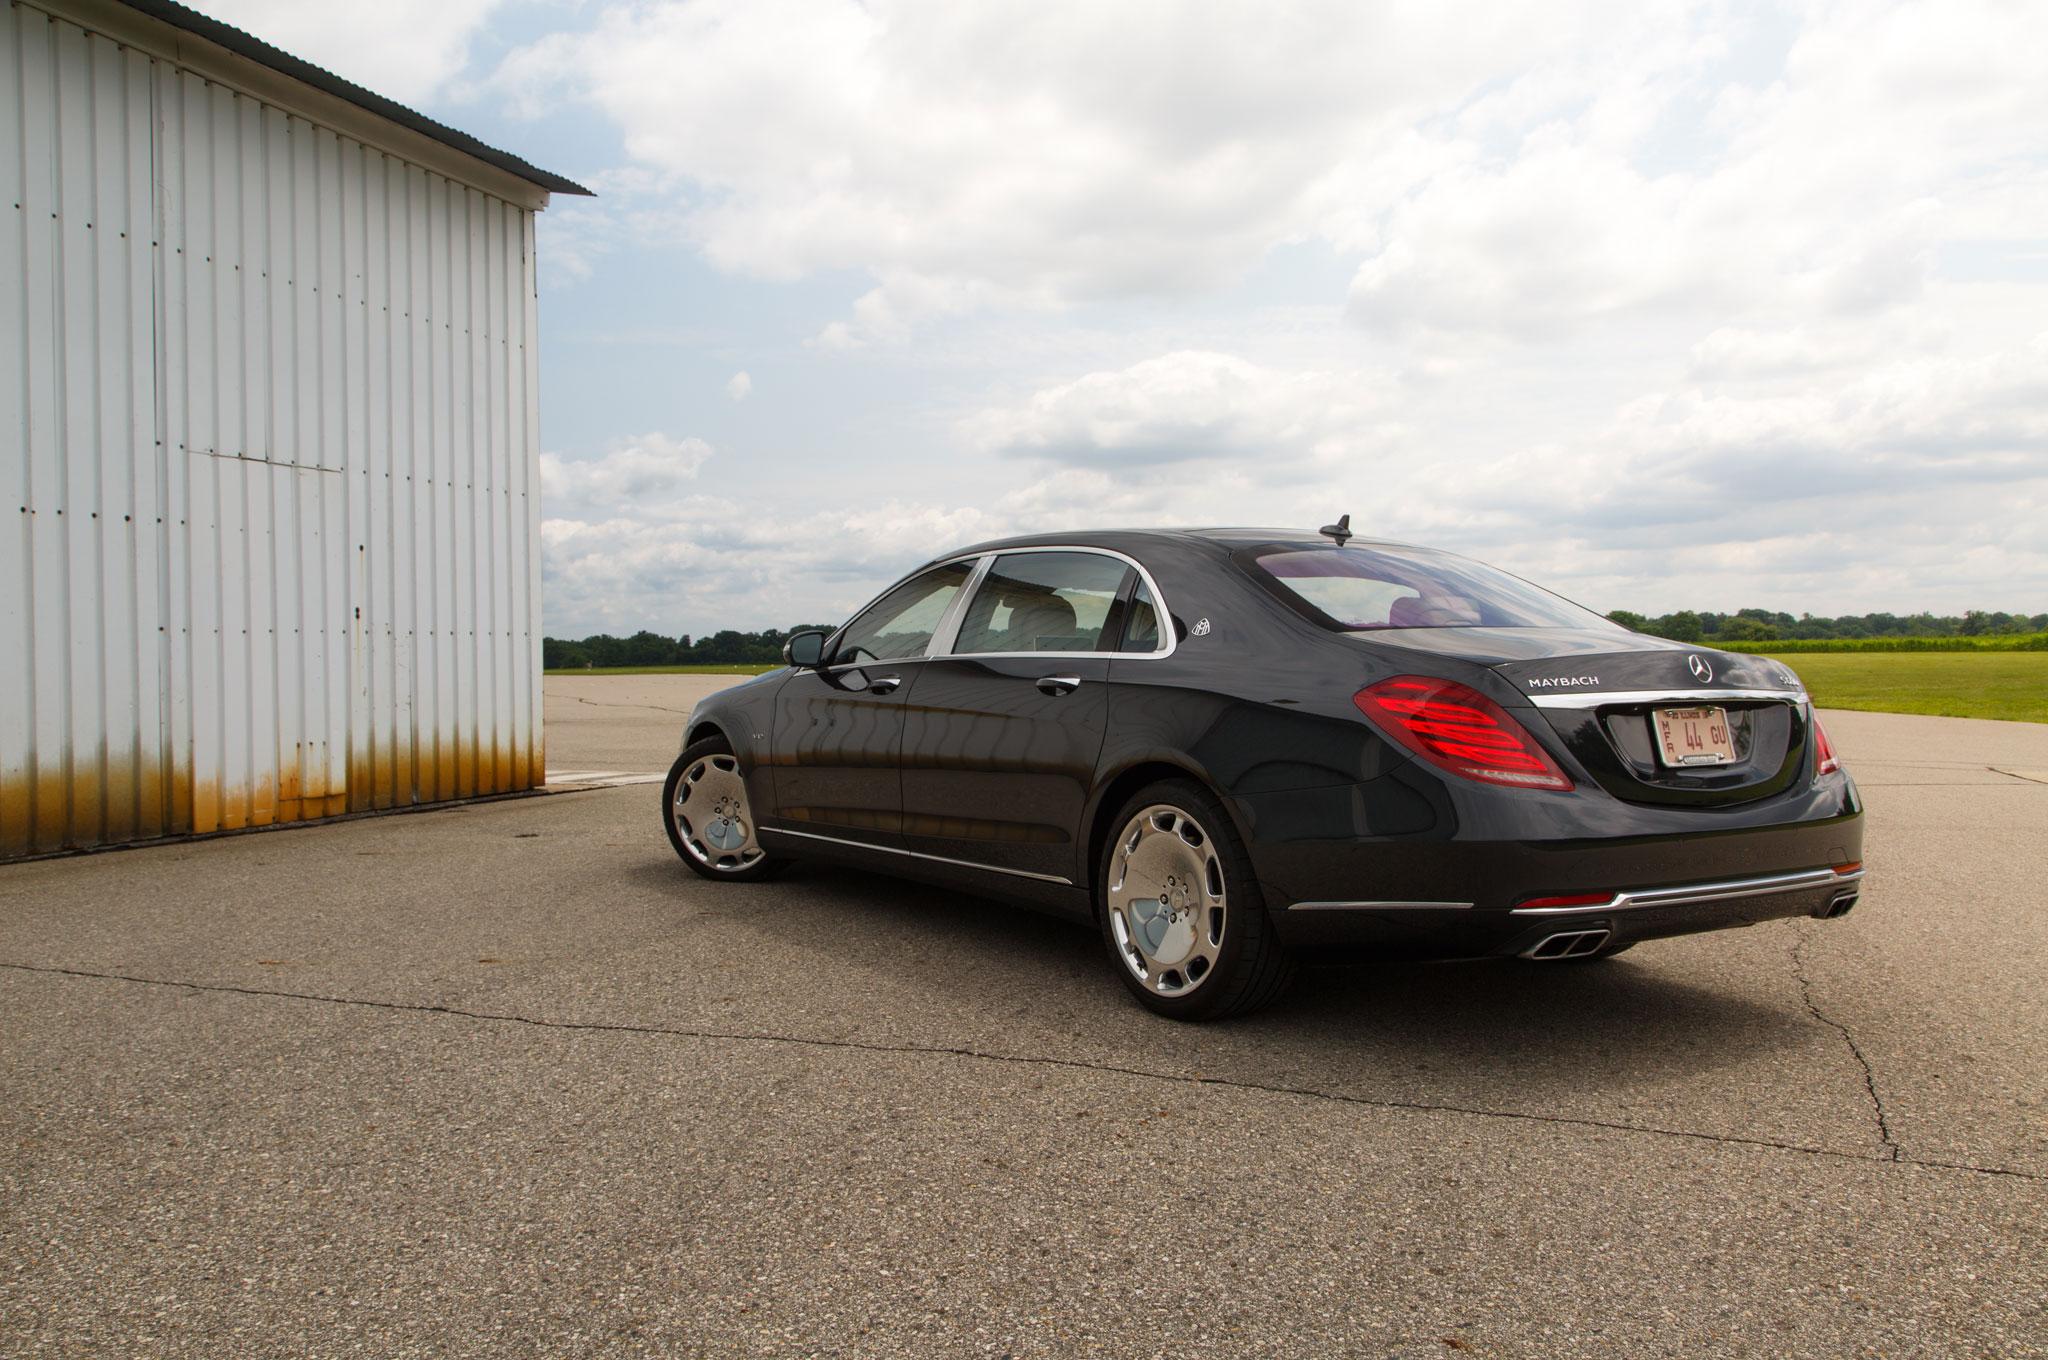 https://st.automobilemag.com/uploads/sites/11/2015/08/2016-Mercedes-Maybach-S600-rear-three-quarter-04.jpg